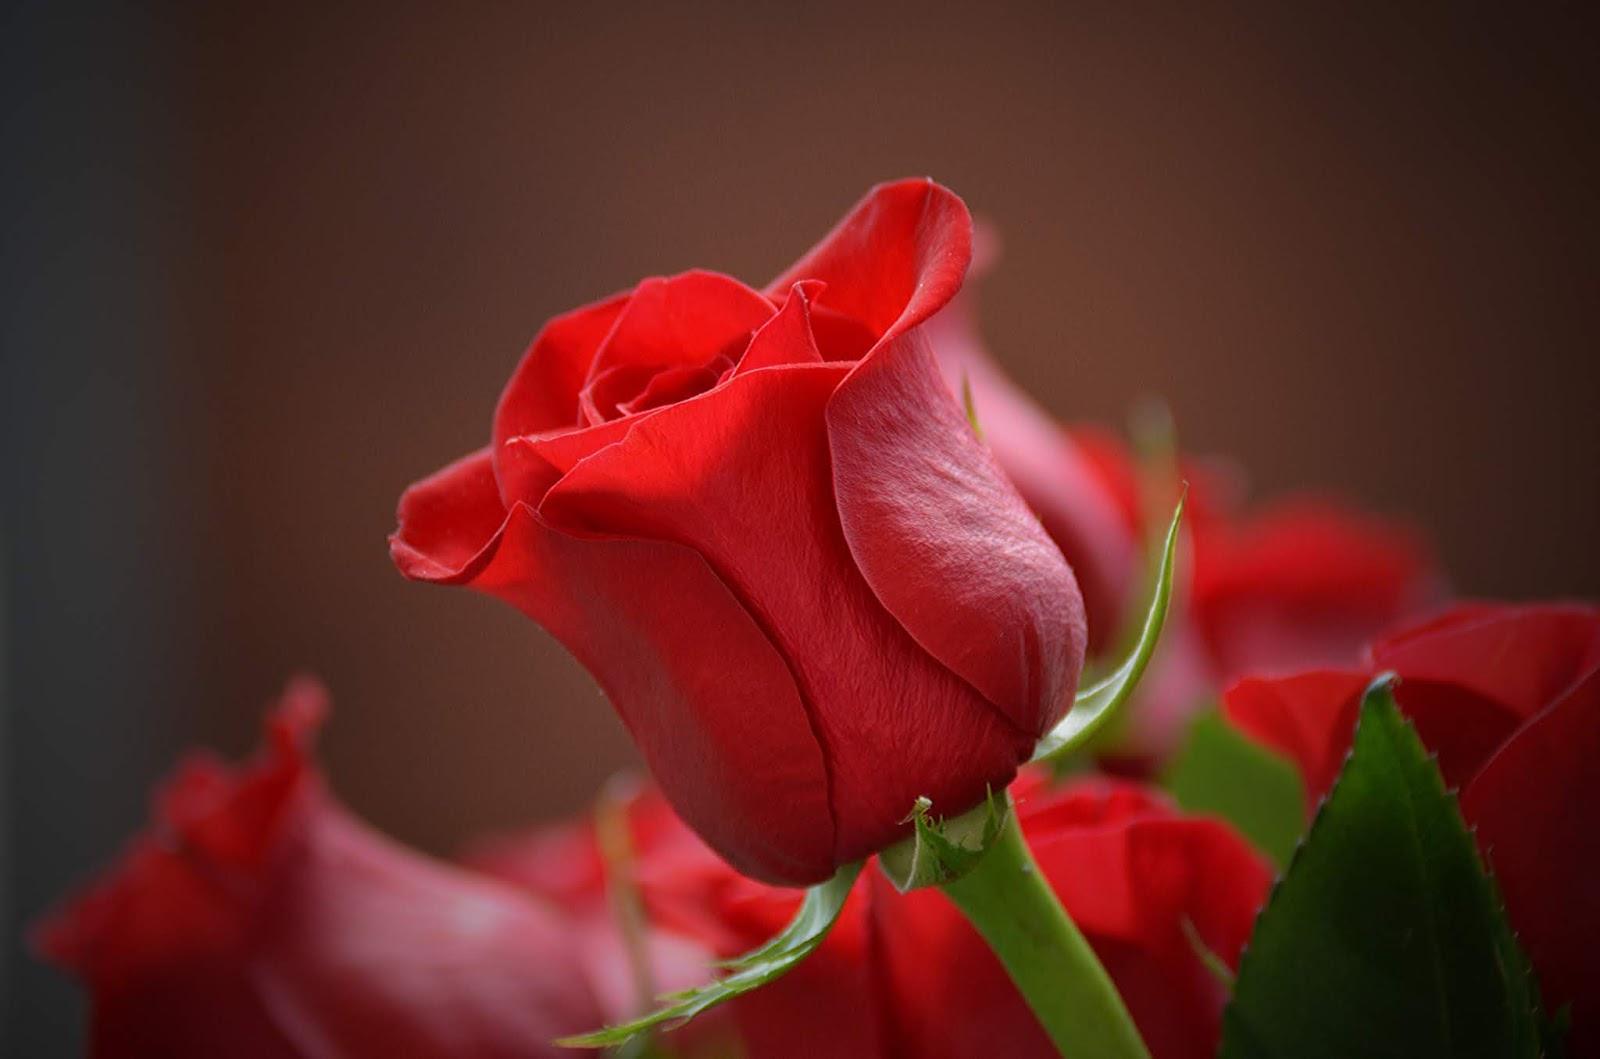 bunga mawar merah yang sangat cantik